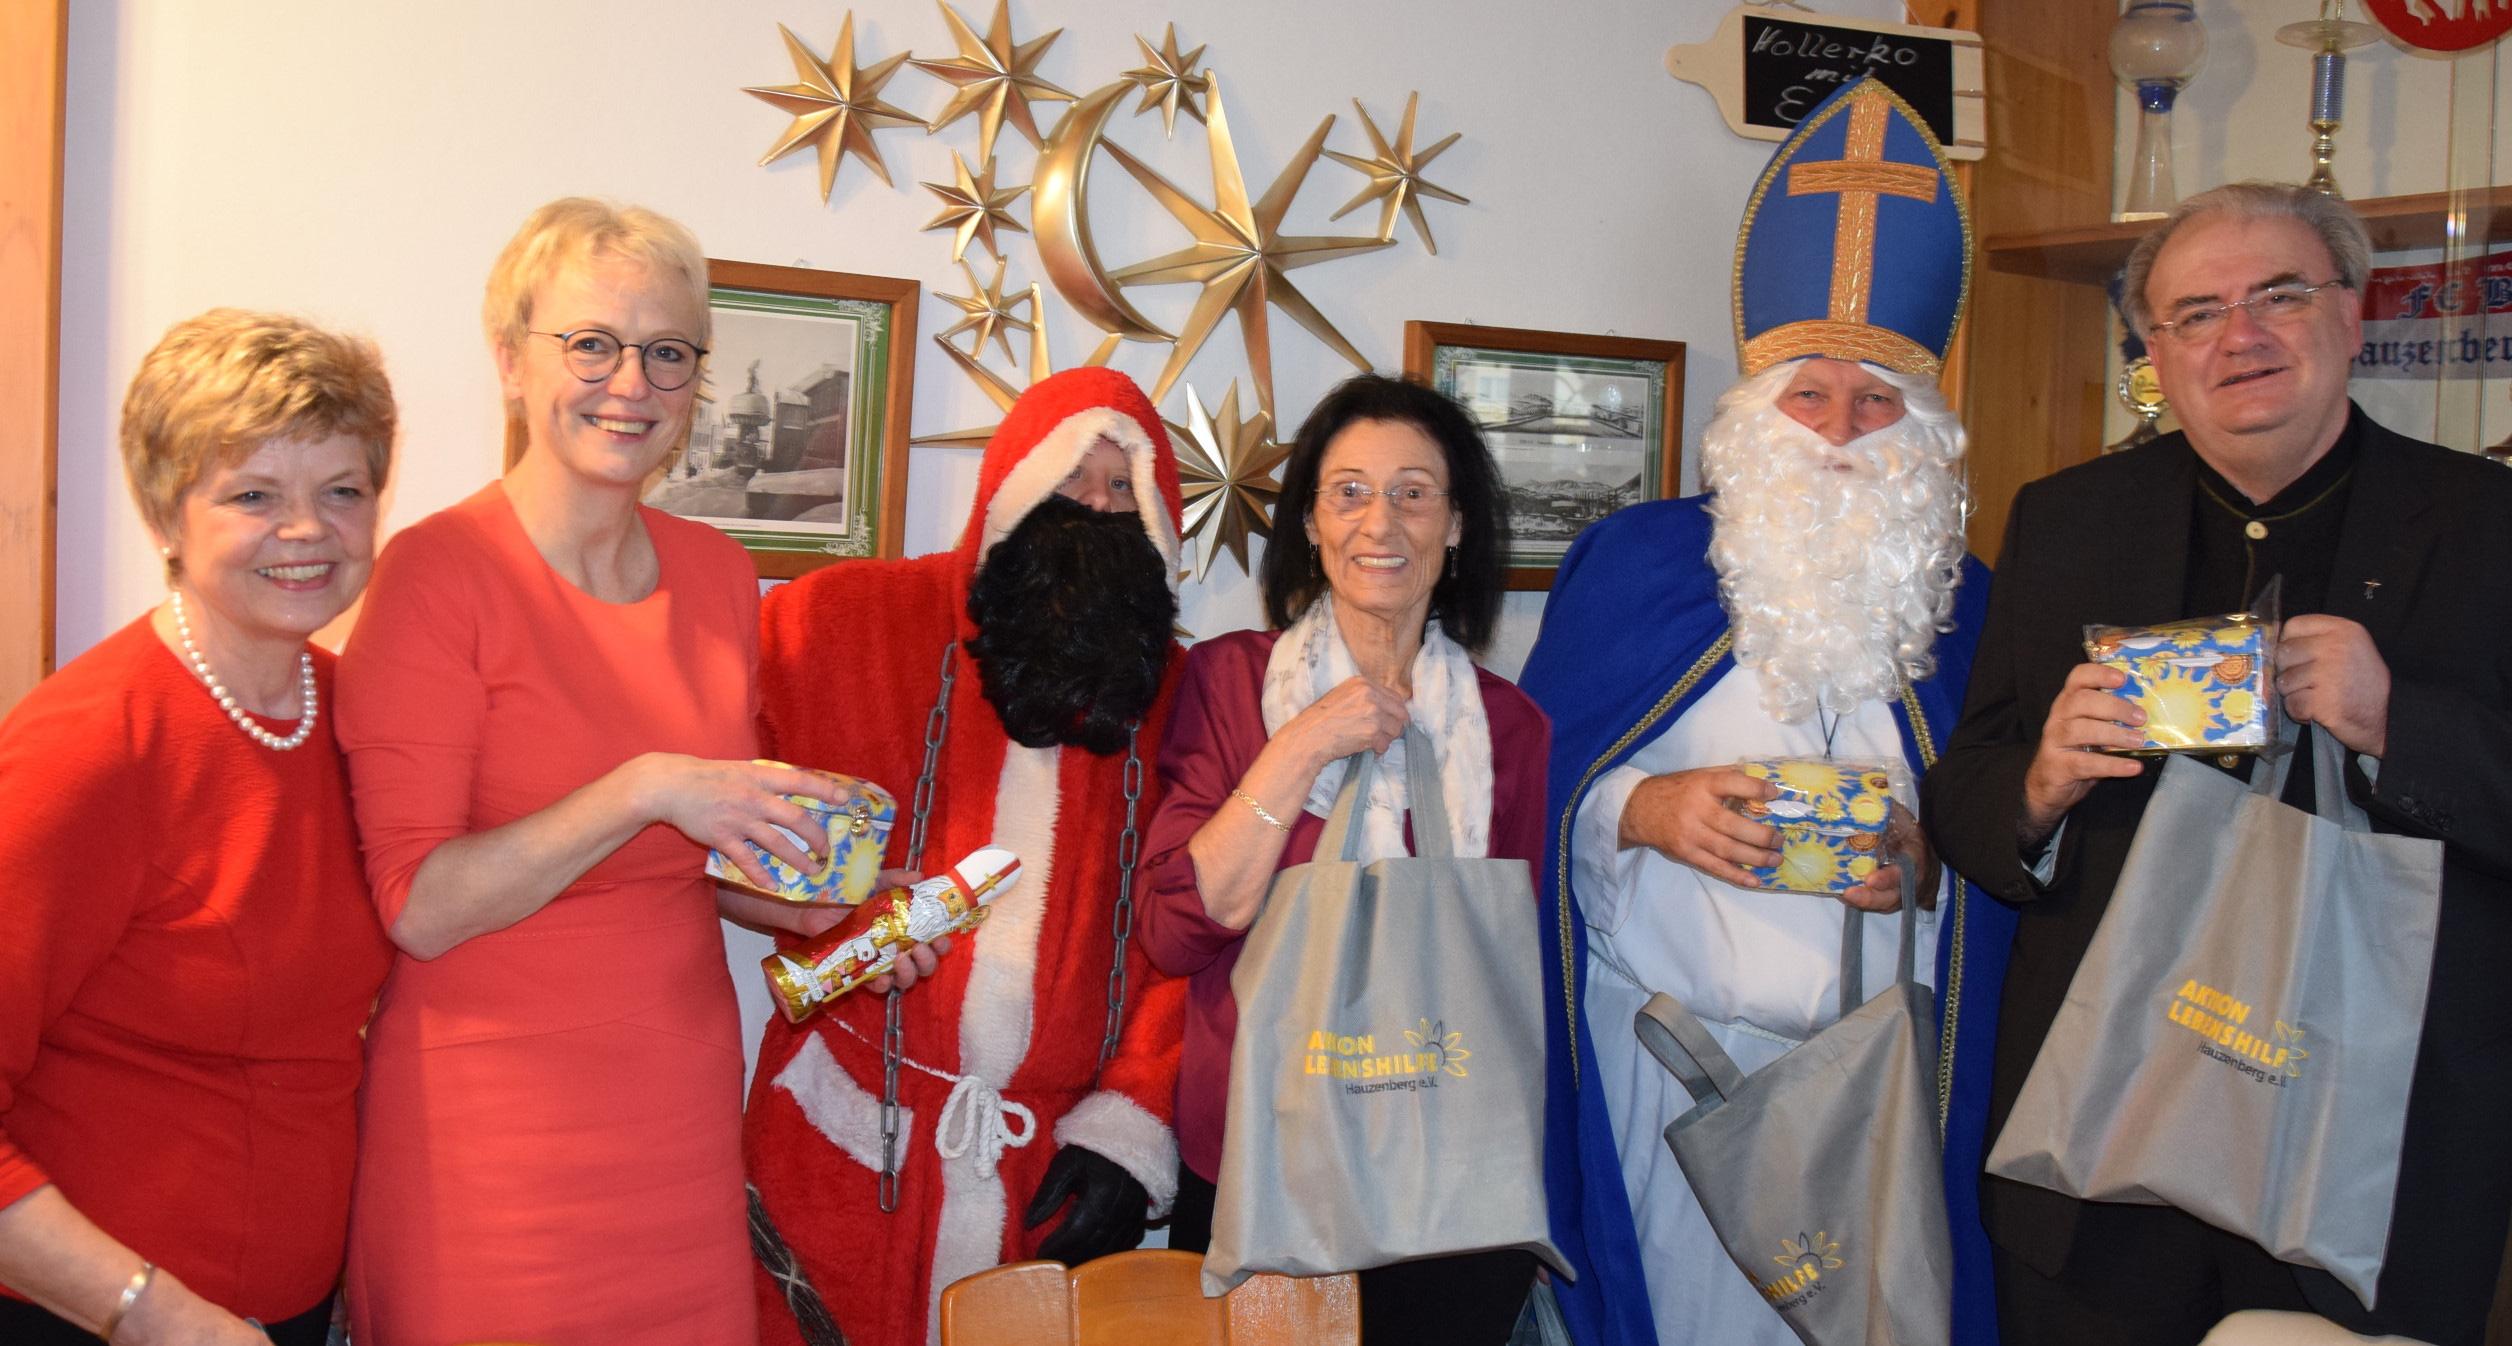 Nikolausfeier der Aktion Lebenshilfe Hauzenberg e.V.